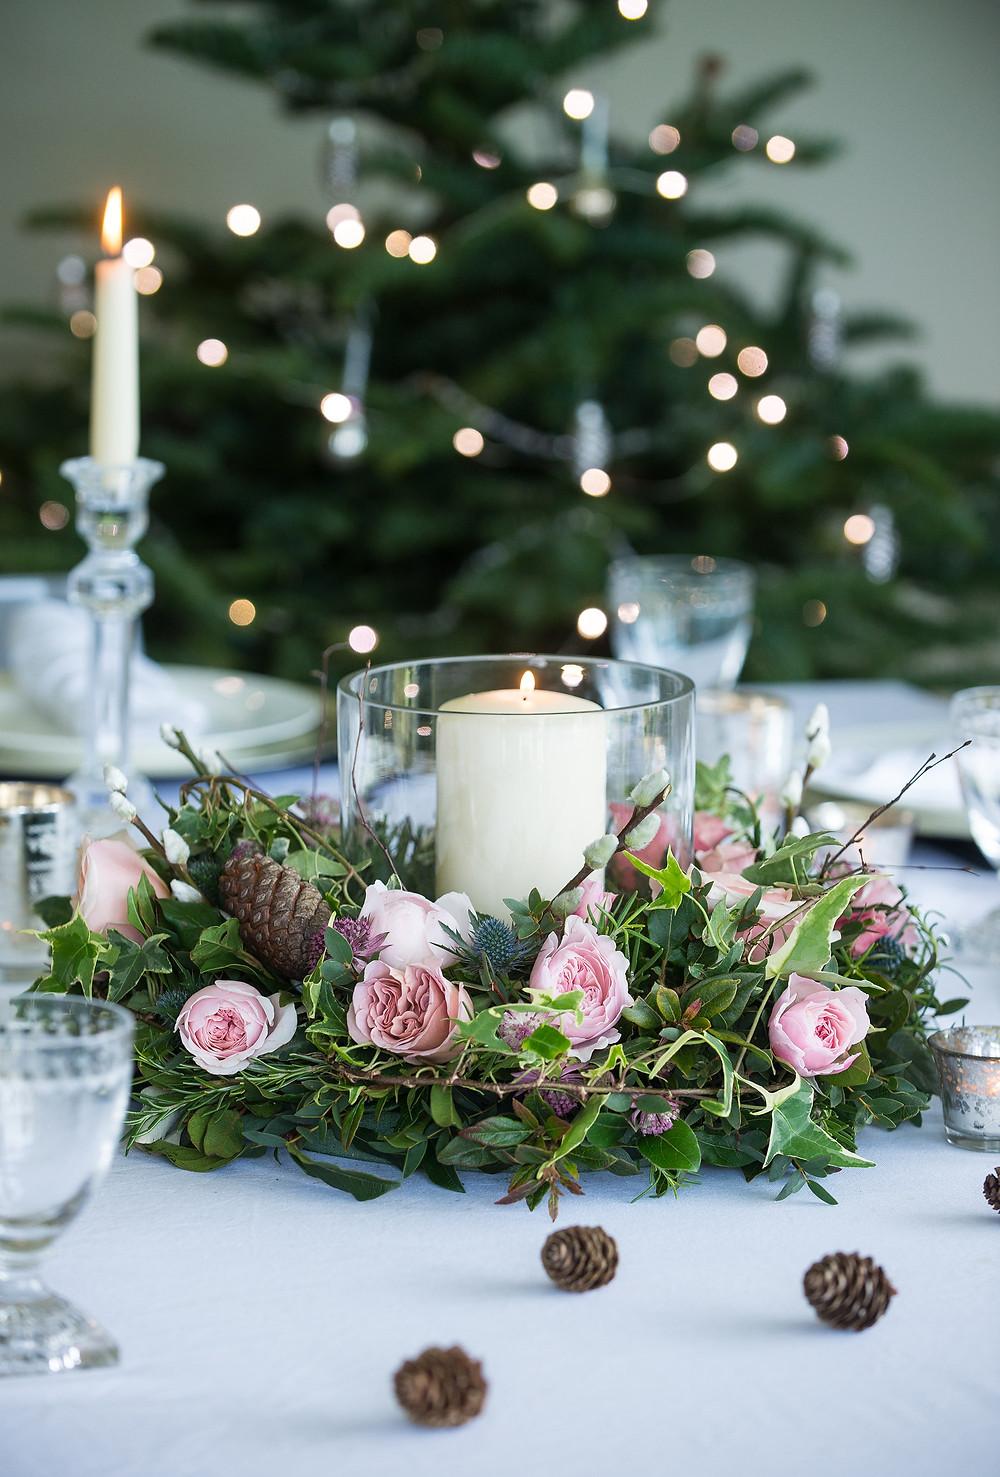 Floral Christmas wreath